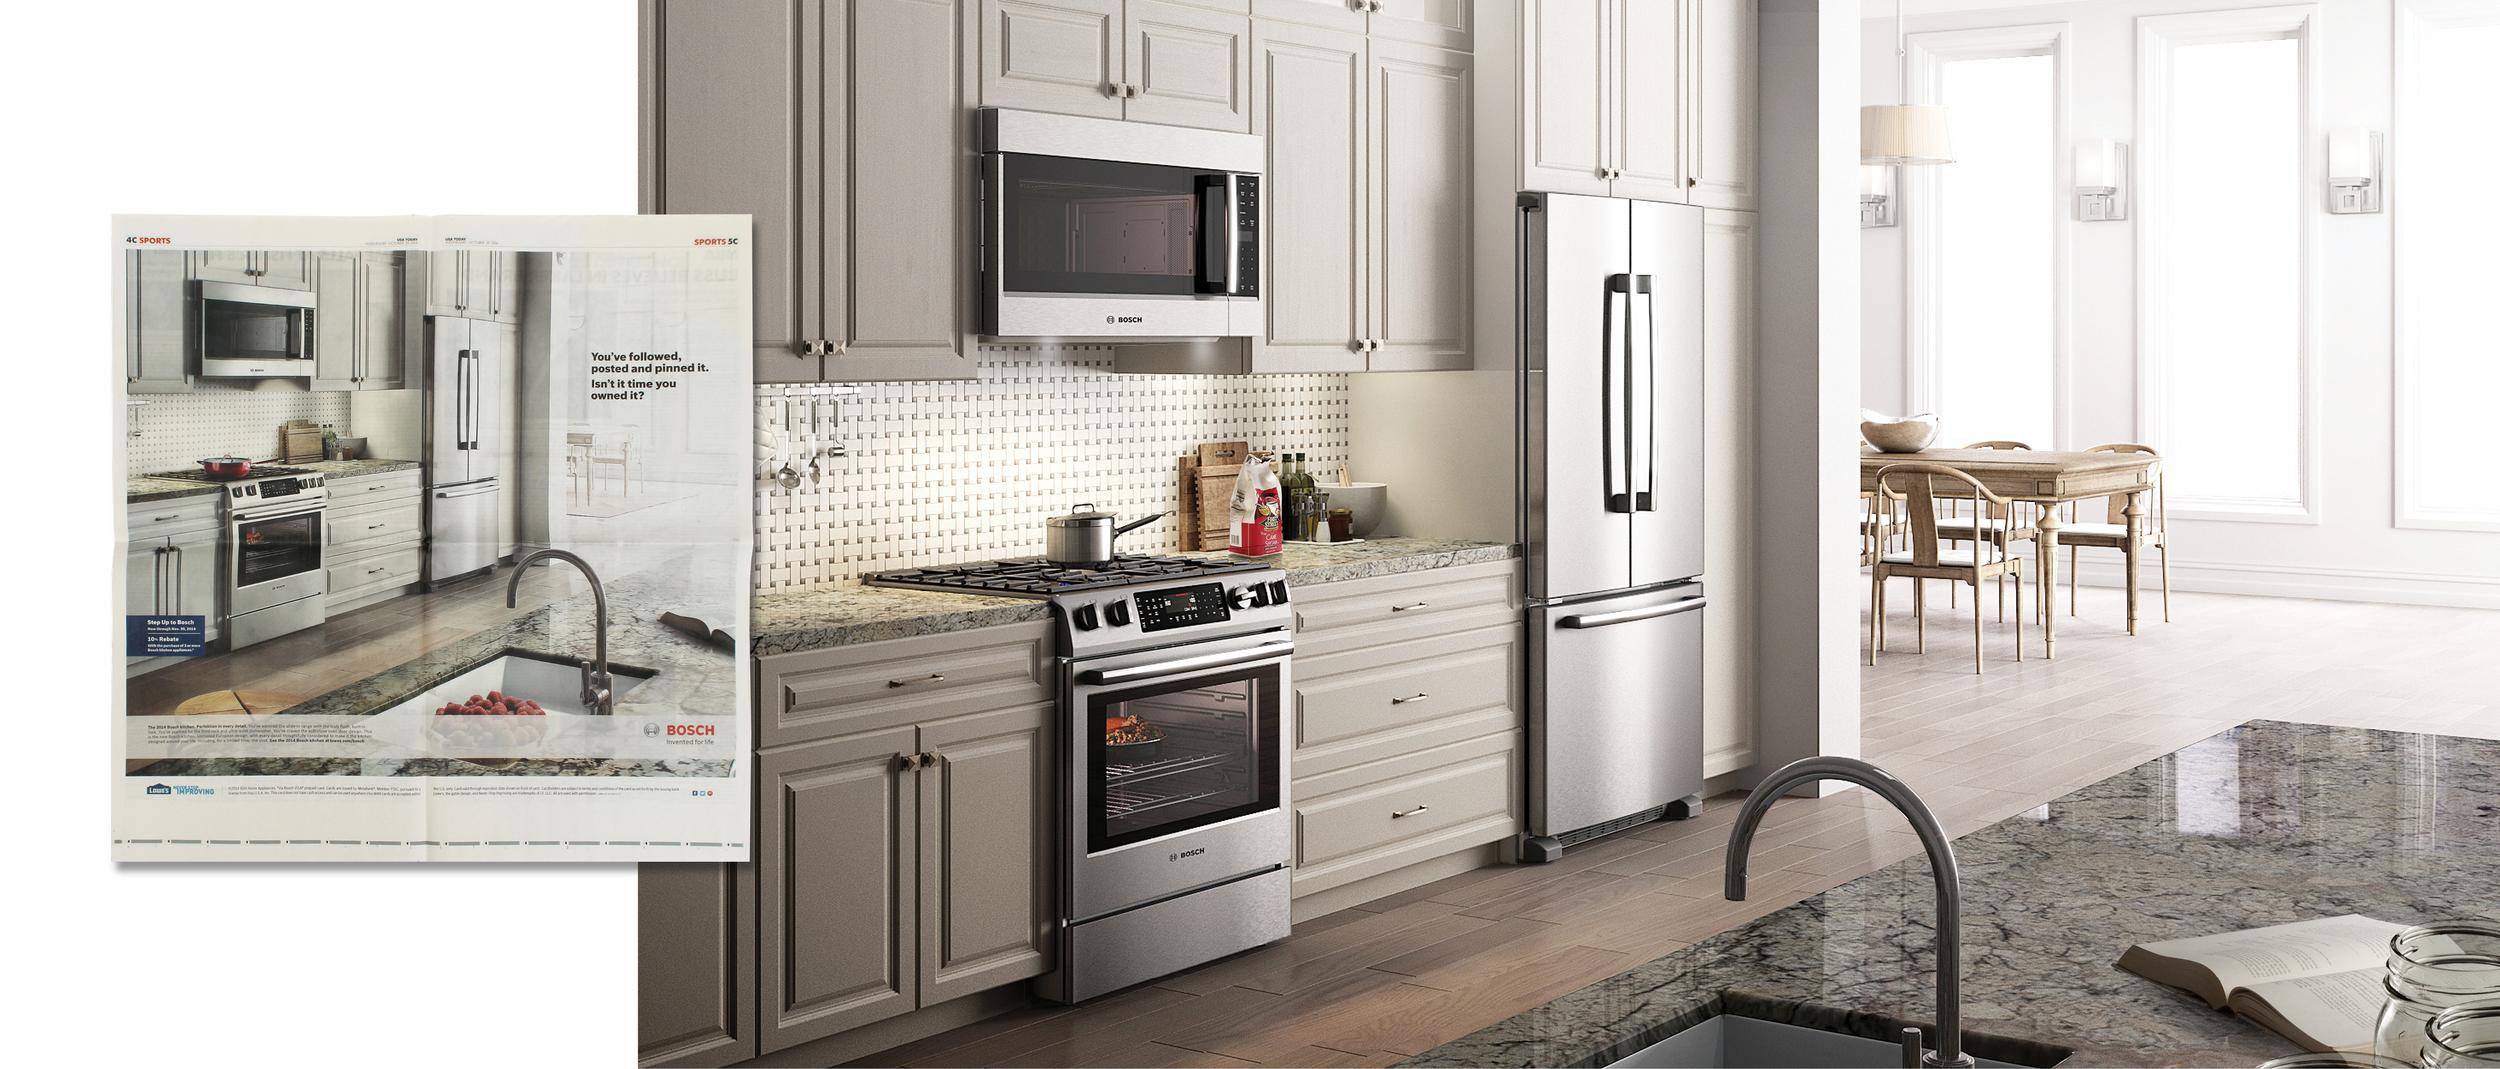 bosch kitchen sink cabinet size work full service creative agency truth and truthwebsite c22 jpg